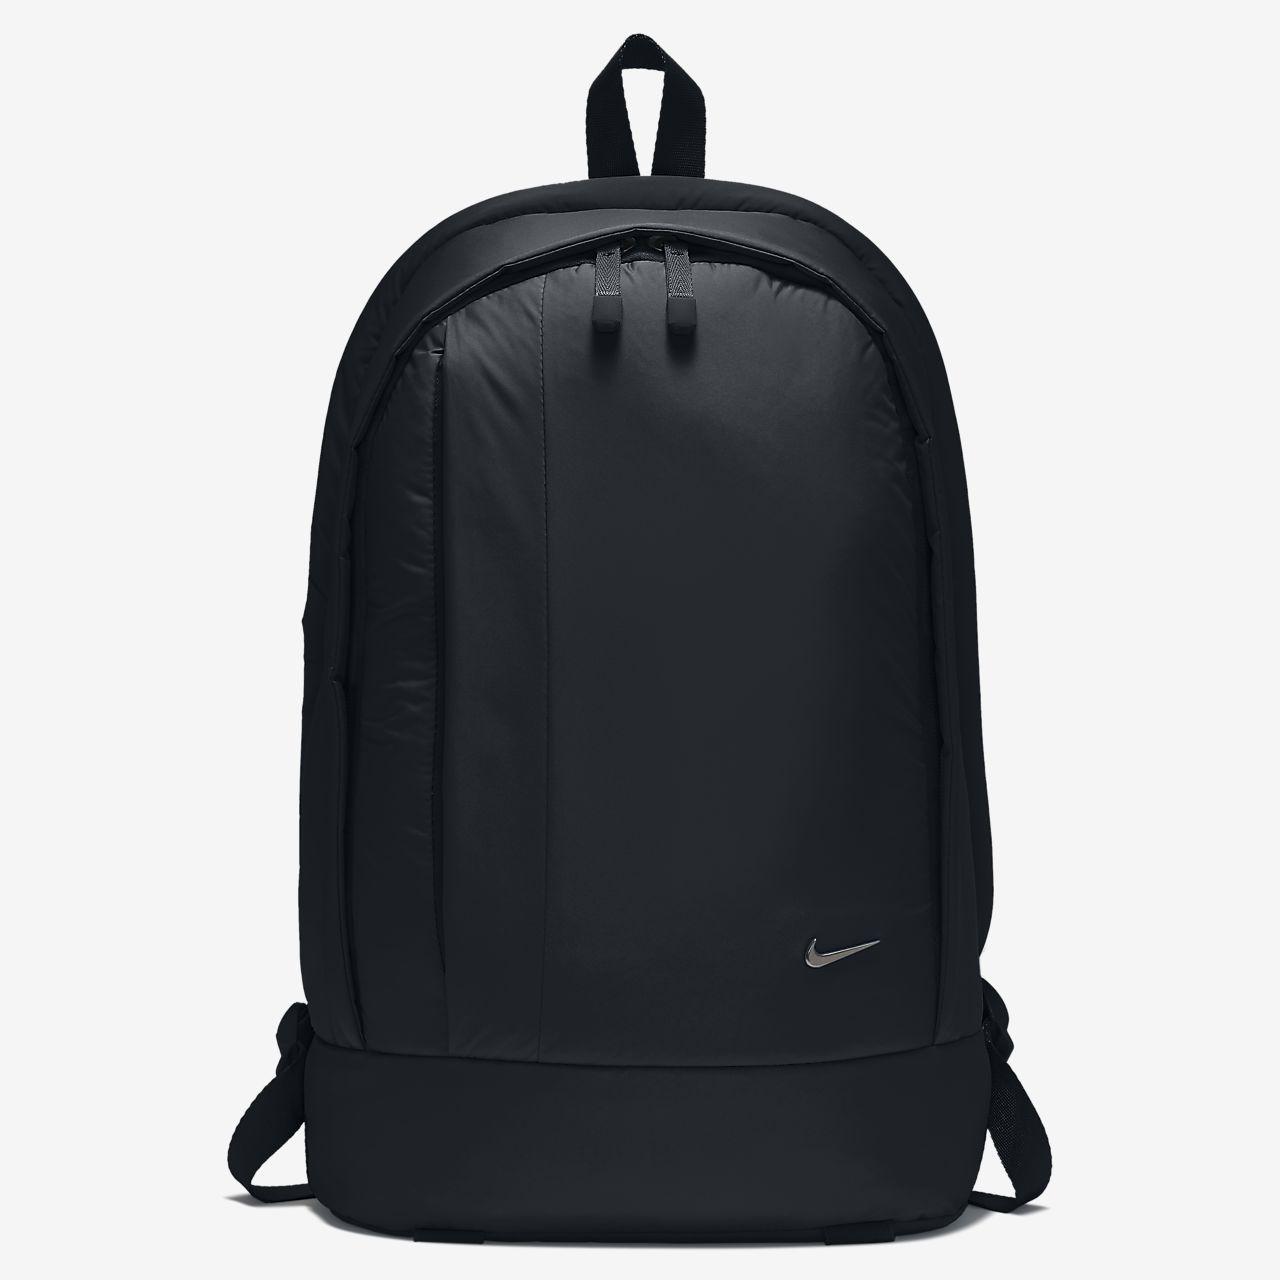 fd65e2c0fb40 Nike Legend Training Backpack. Nike Legend Training Backpack Black ...